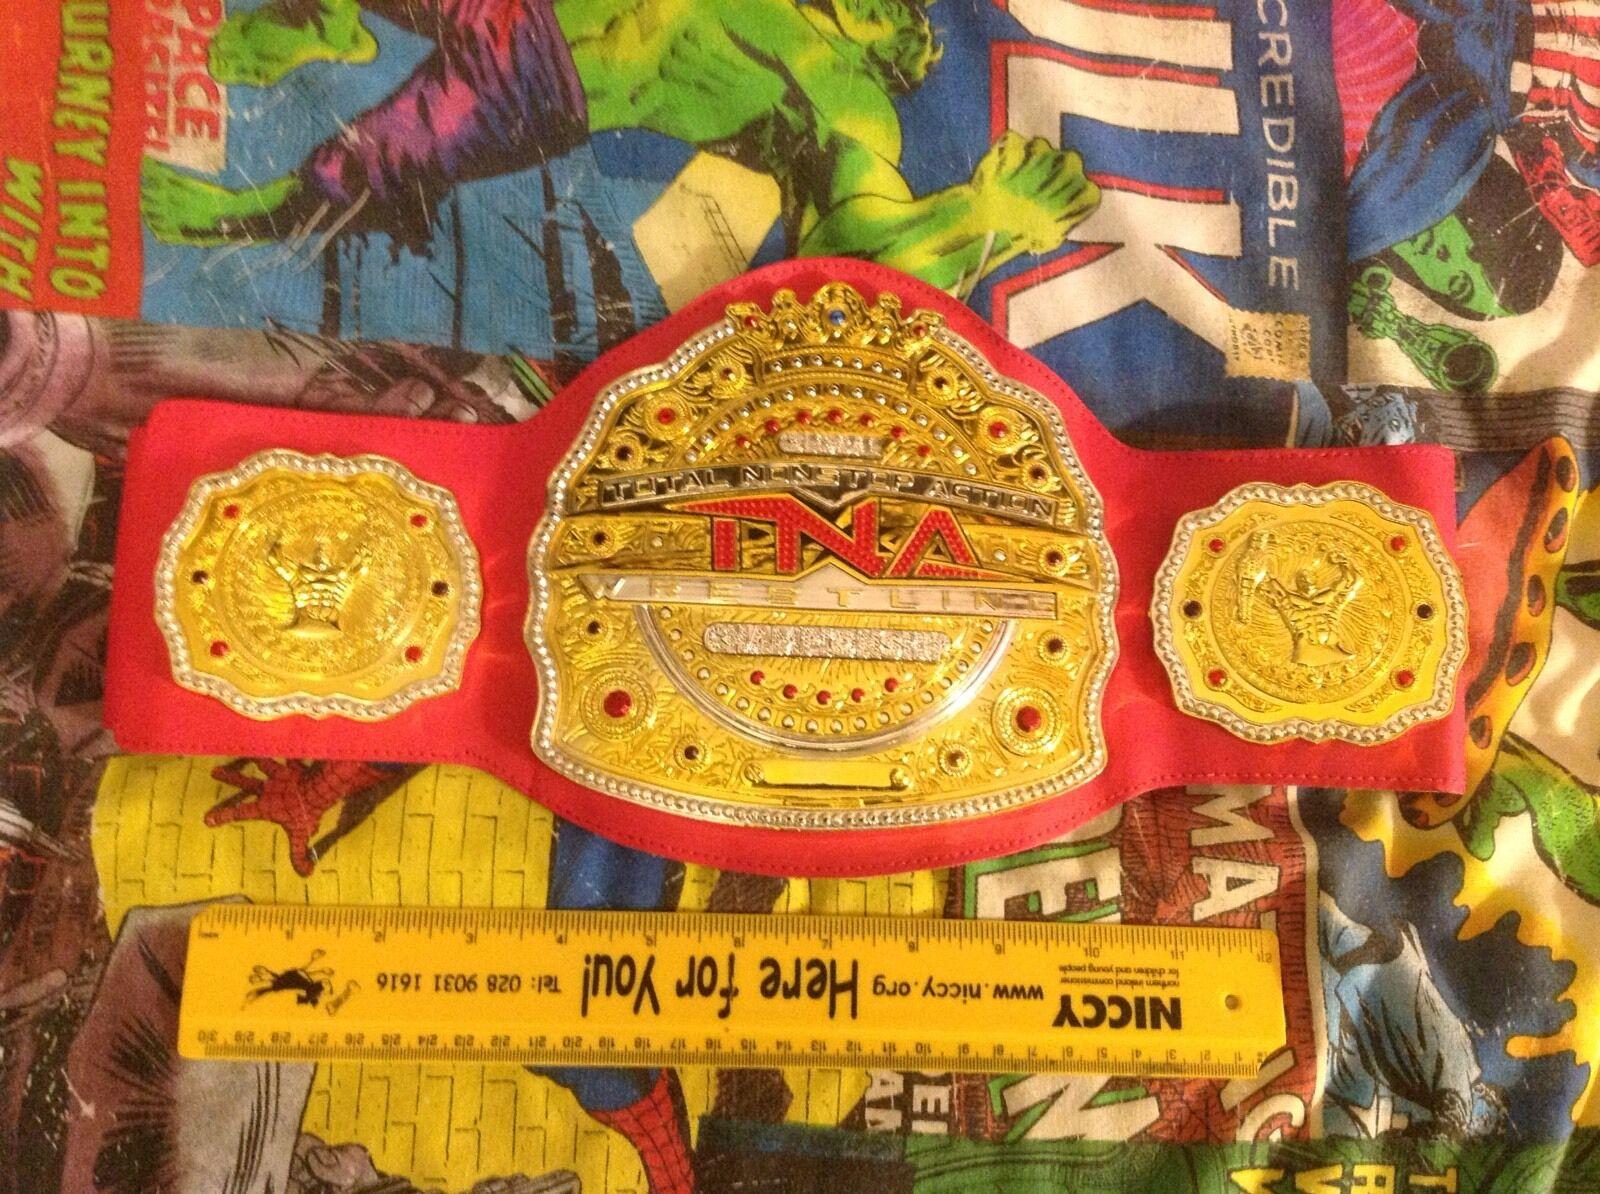 TNA Global Championship Replica Belt 2010 Jakks Pacific - Red - Very Rare